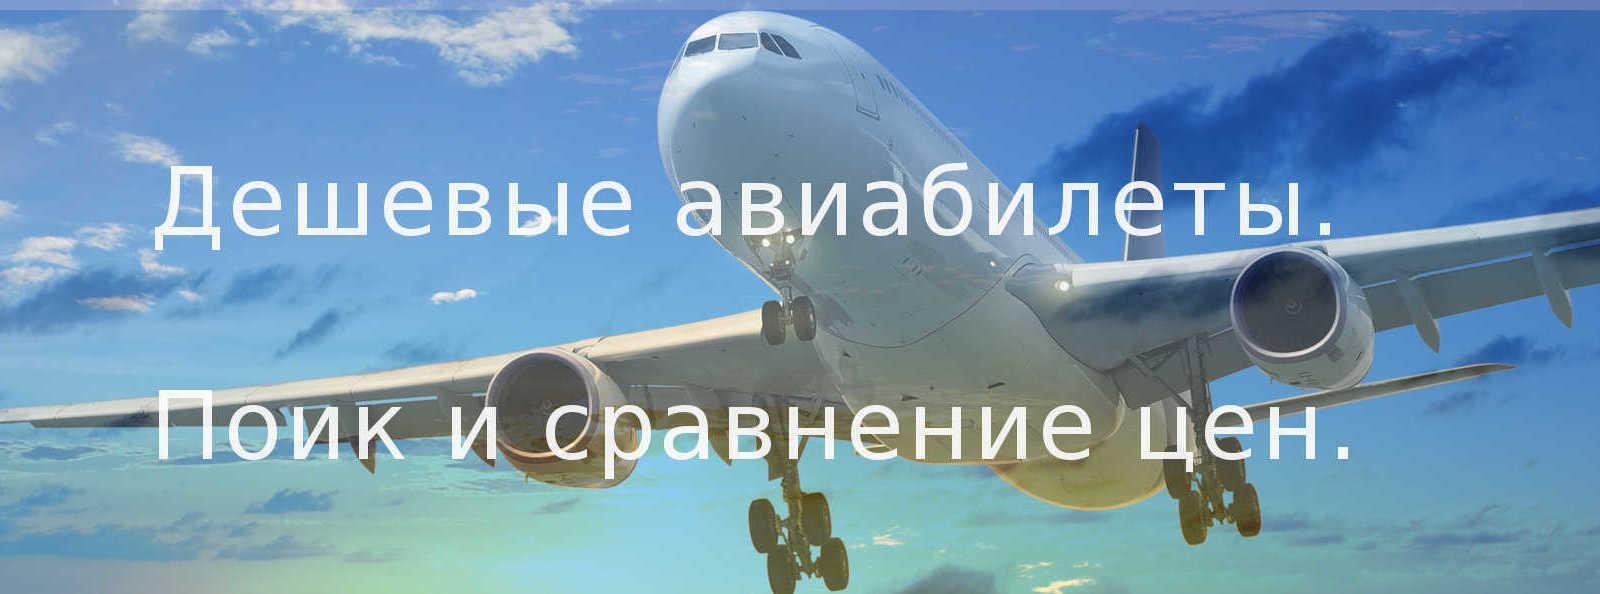 Заказ авиабилетов. Цены на авиабилеты. Аэропорты Москвы